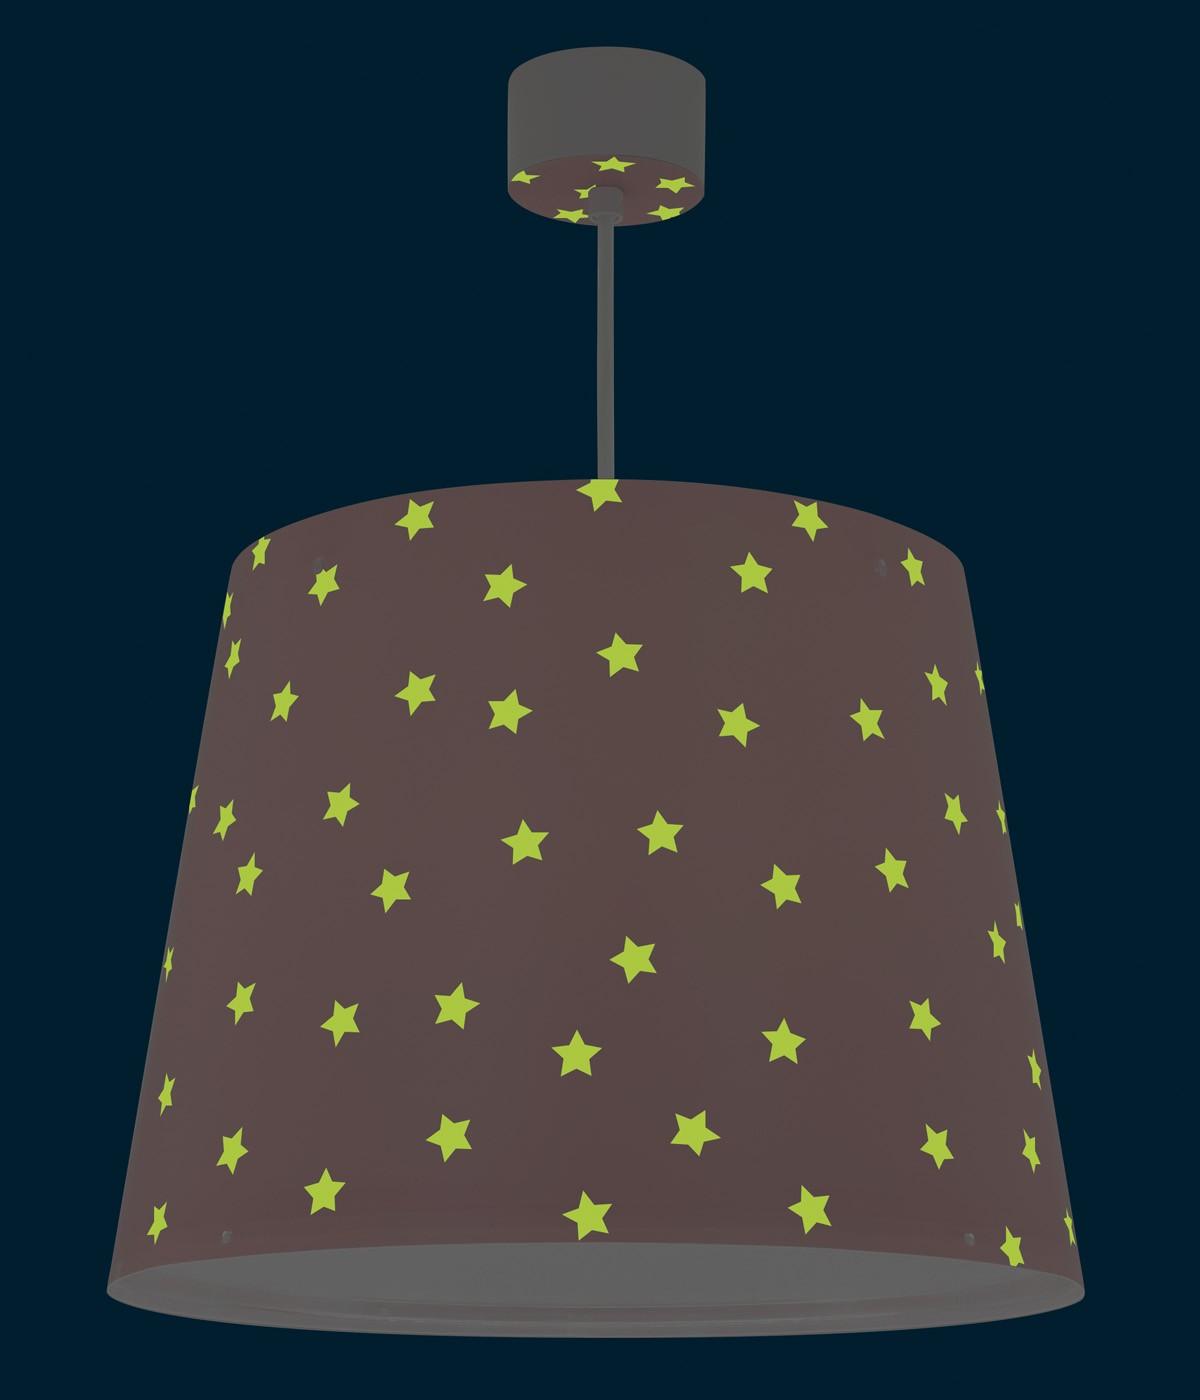 lampara infantil de techo Star Light rosa